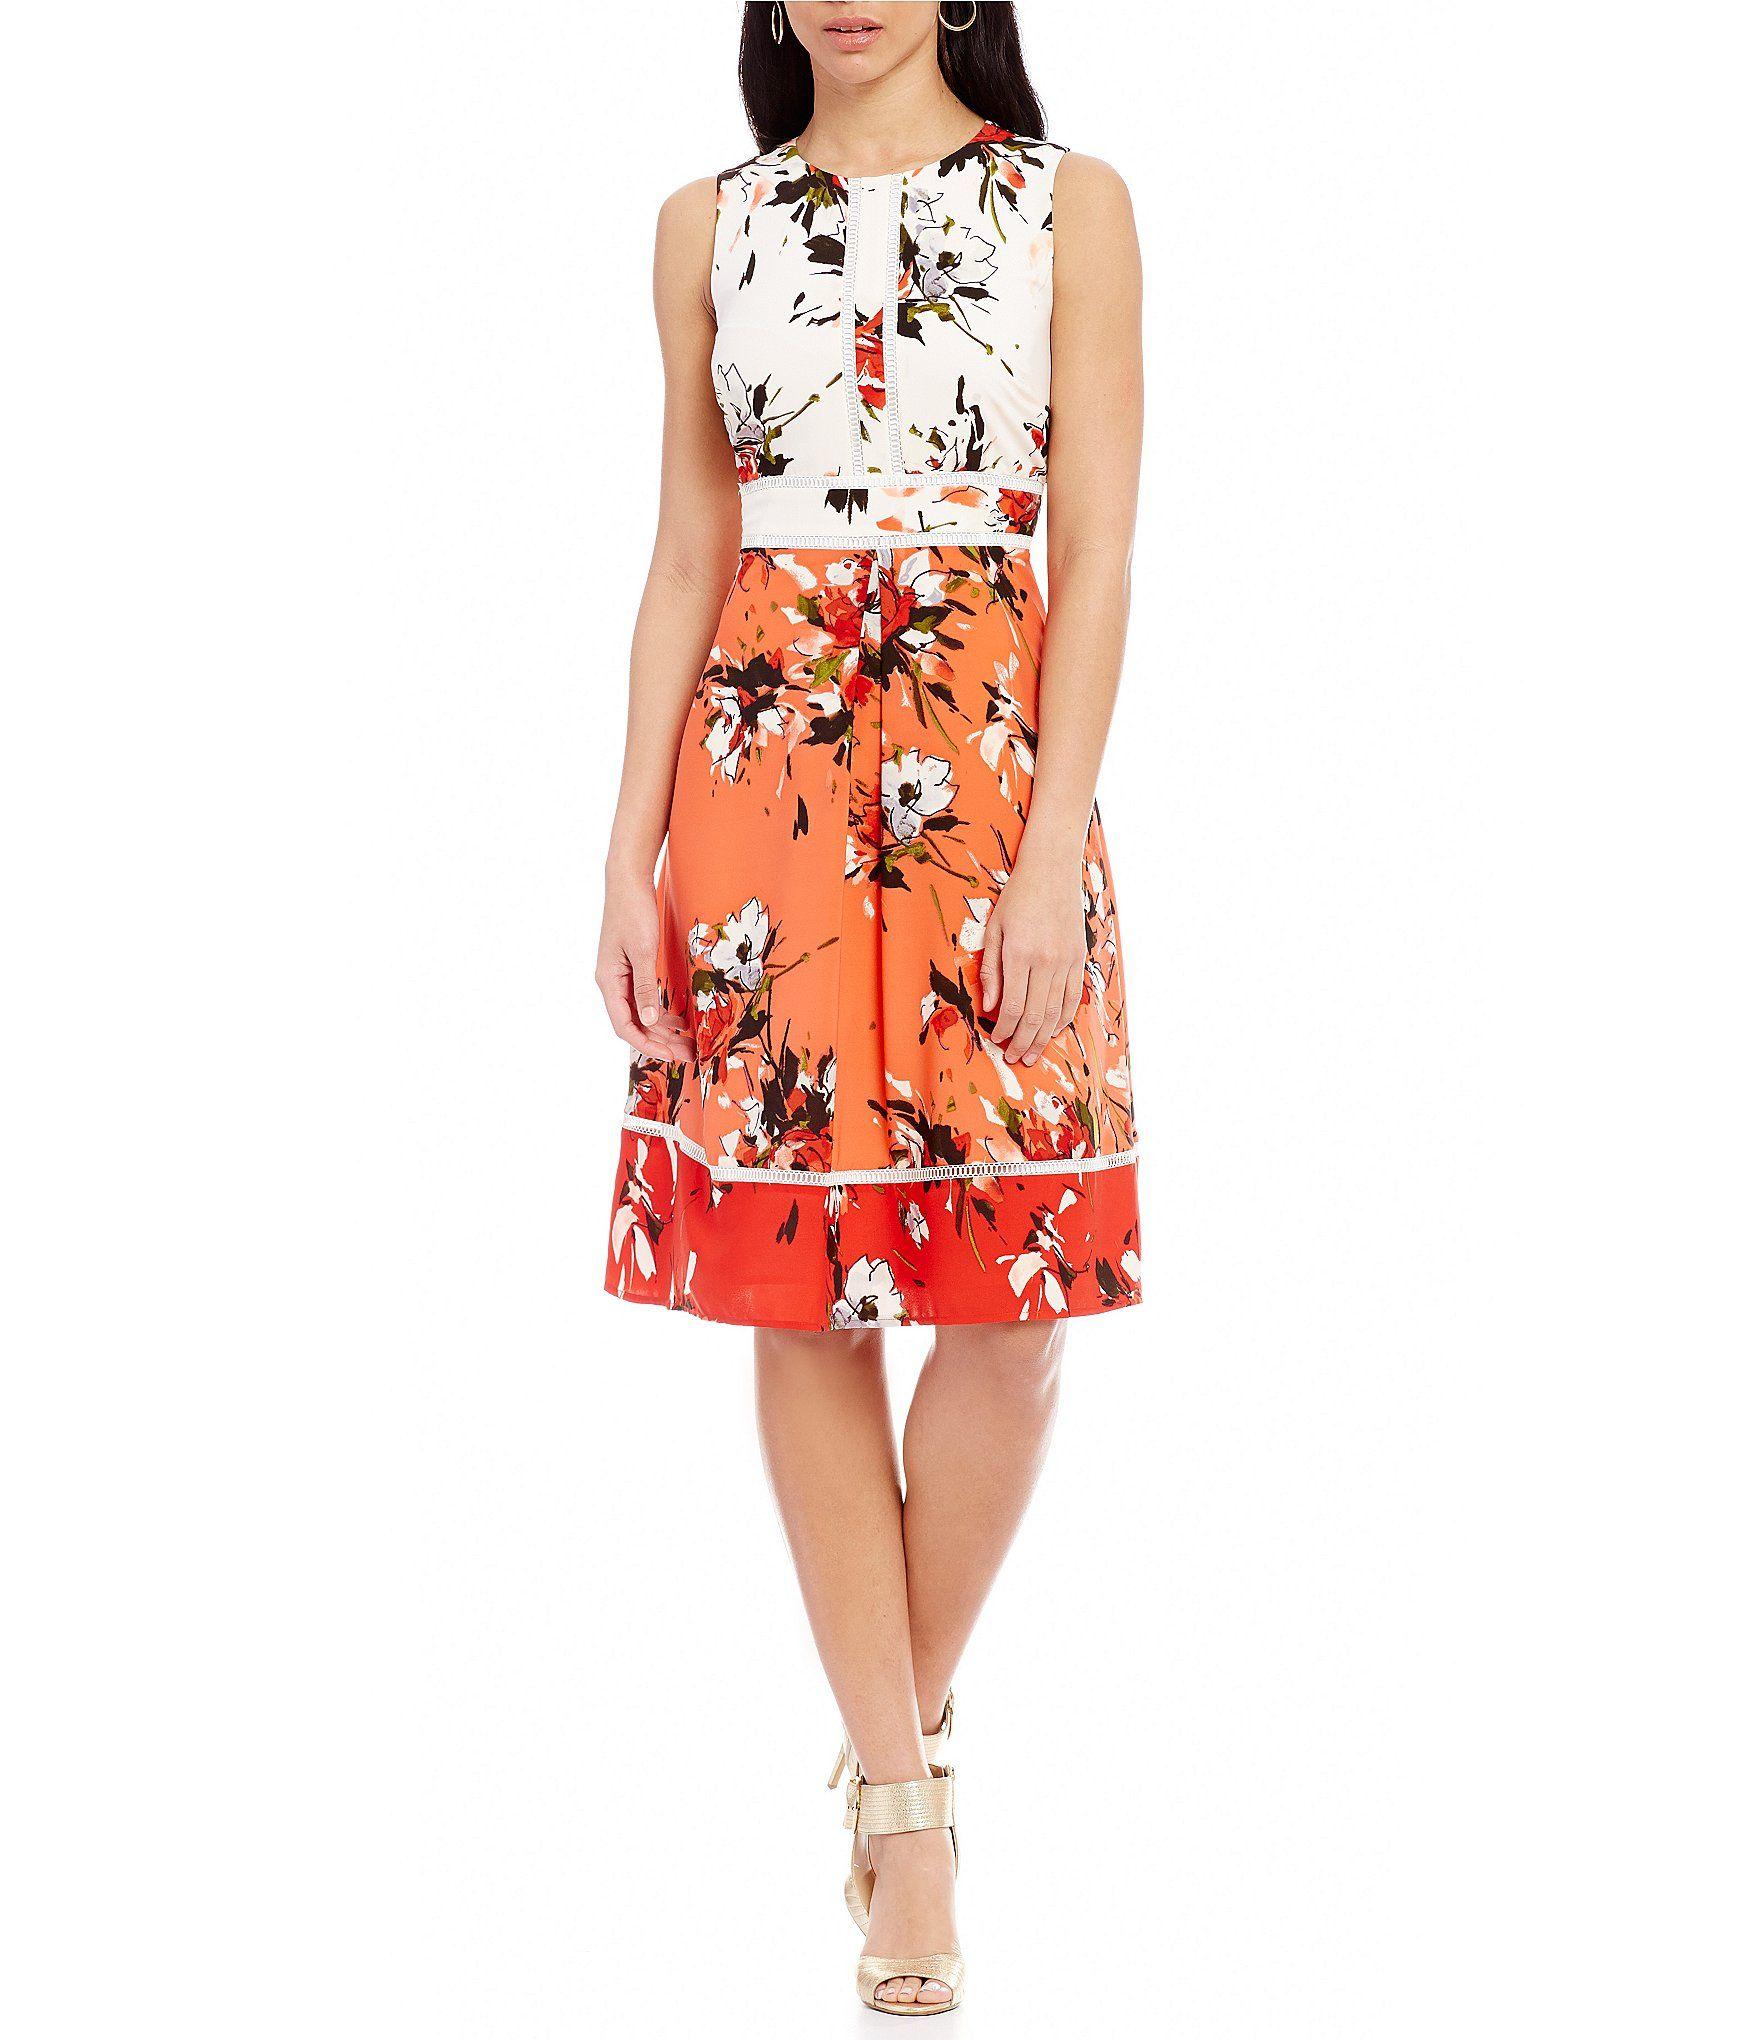 54fe985d10c Shop for KARL LAGERFELD PARIS Sleeveless Floral Dress at Dillards.com. Visit  Dillards.com to find clothing